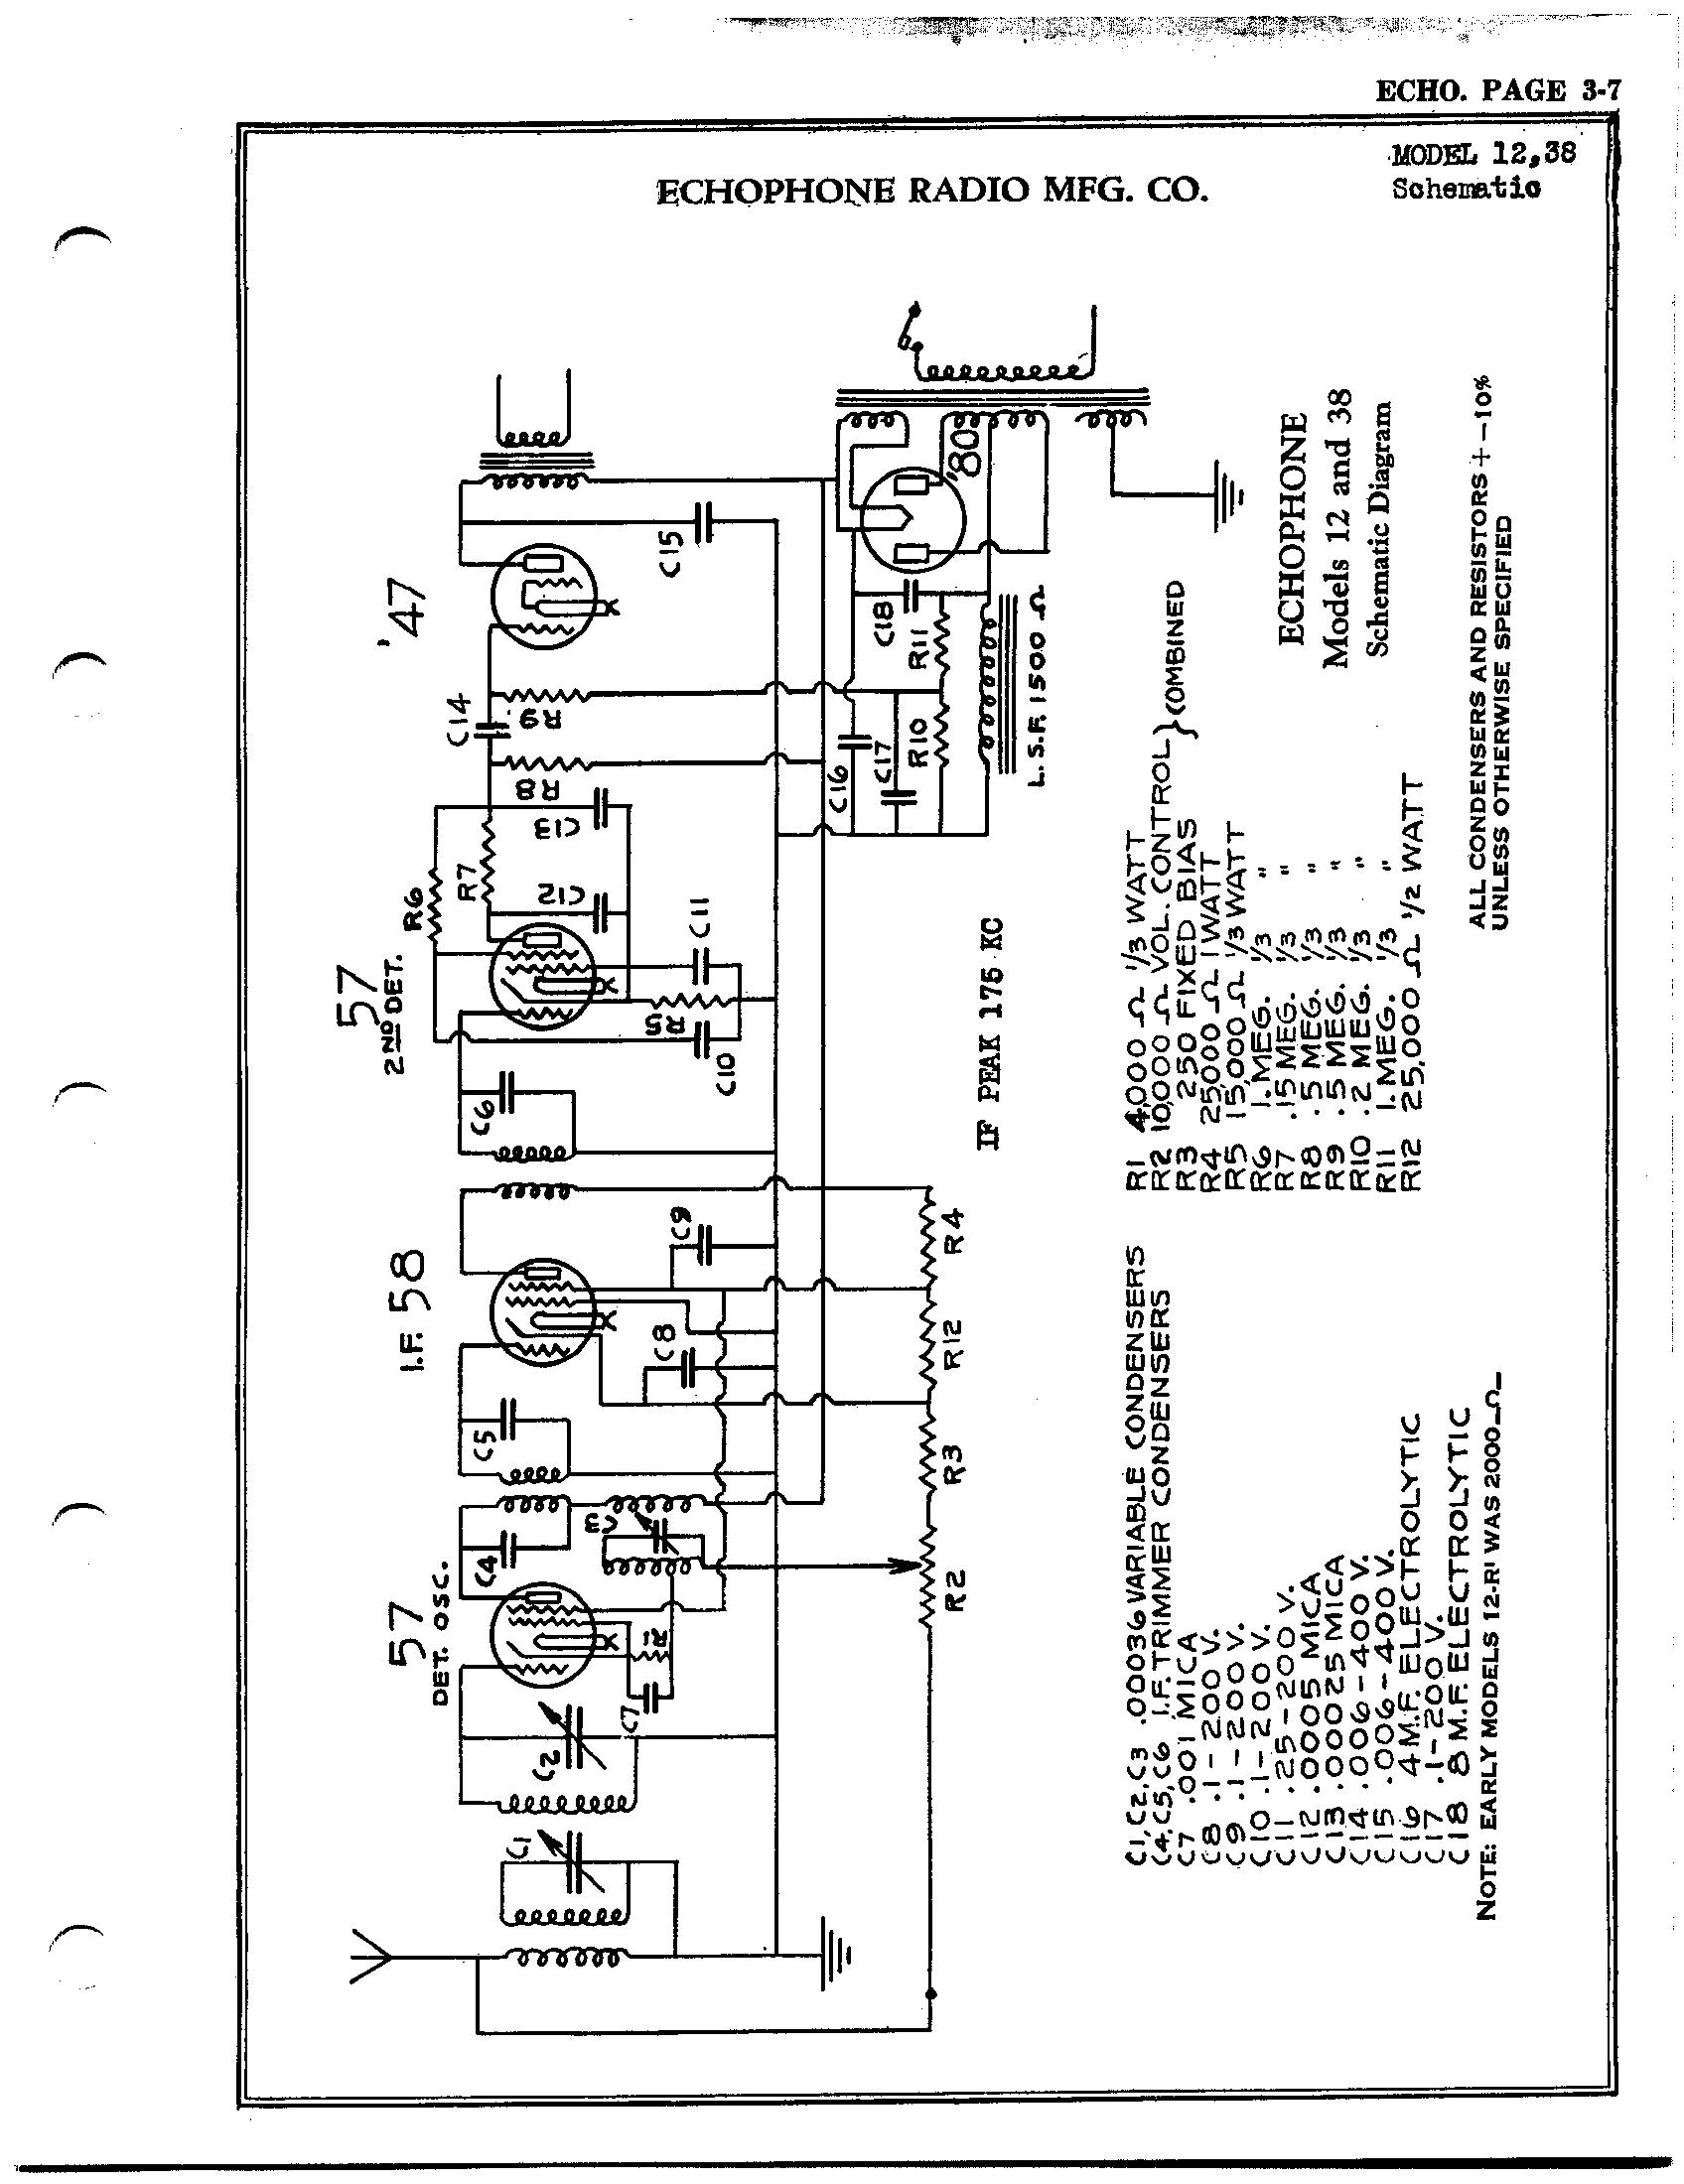 Echophone Radio Corp 12